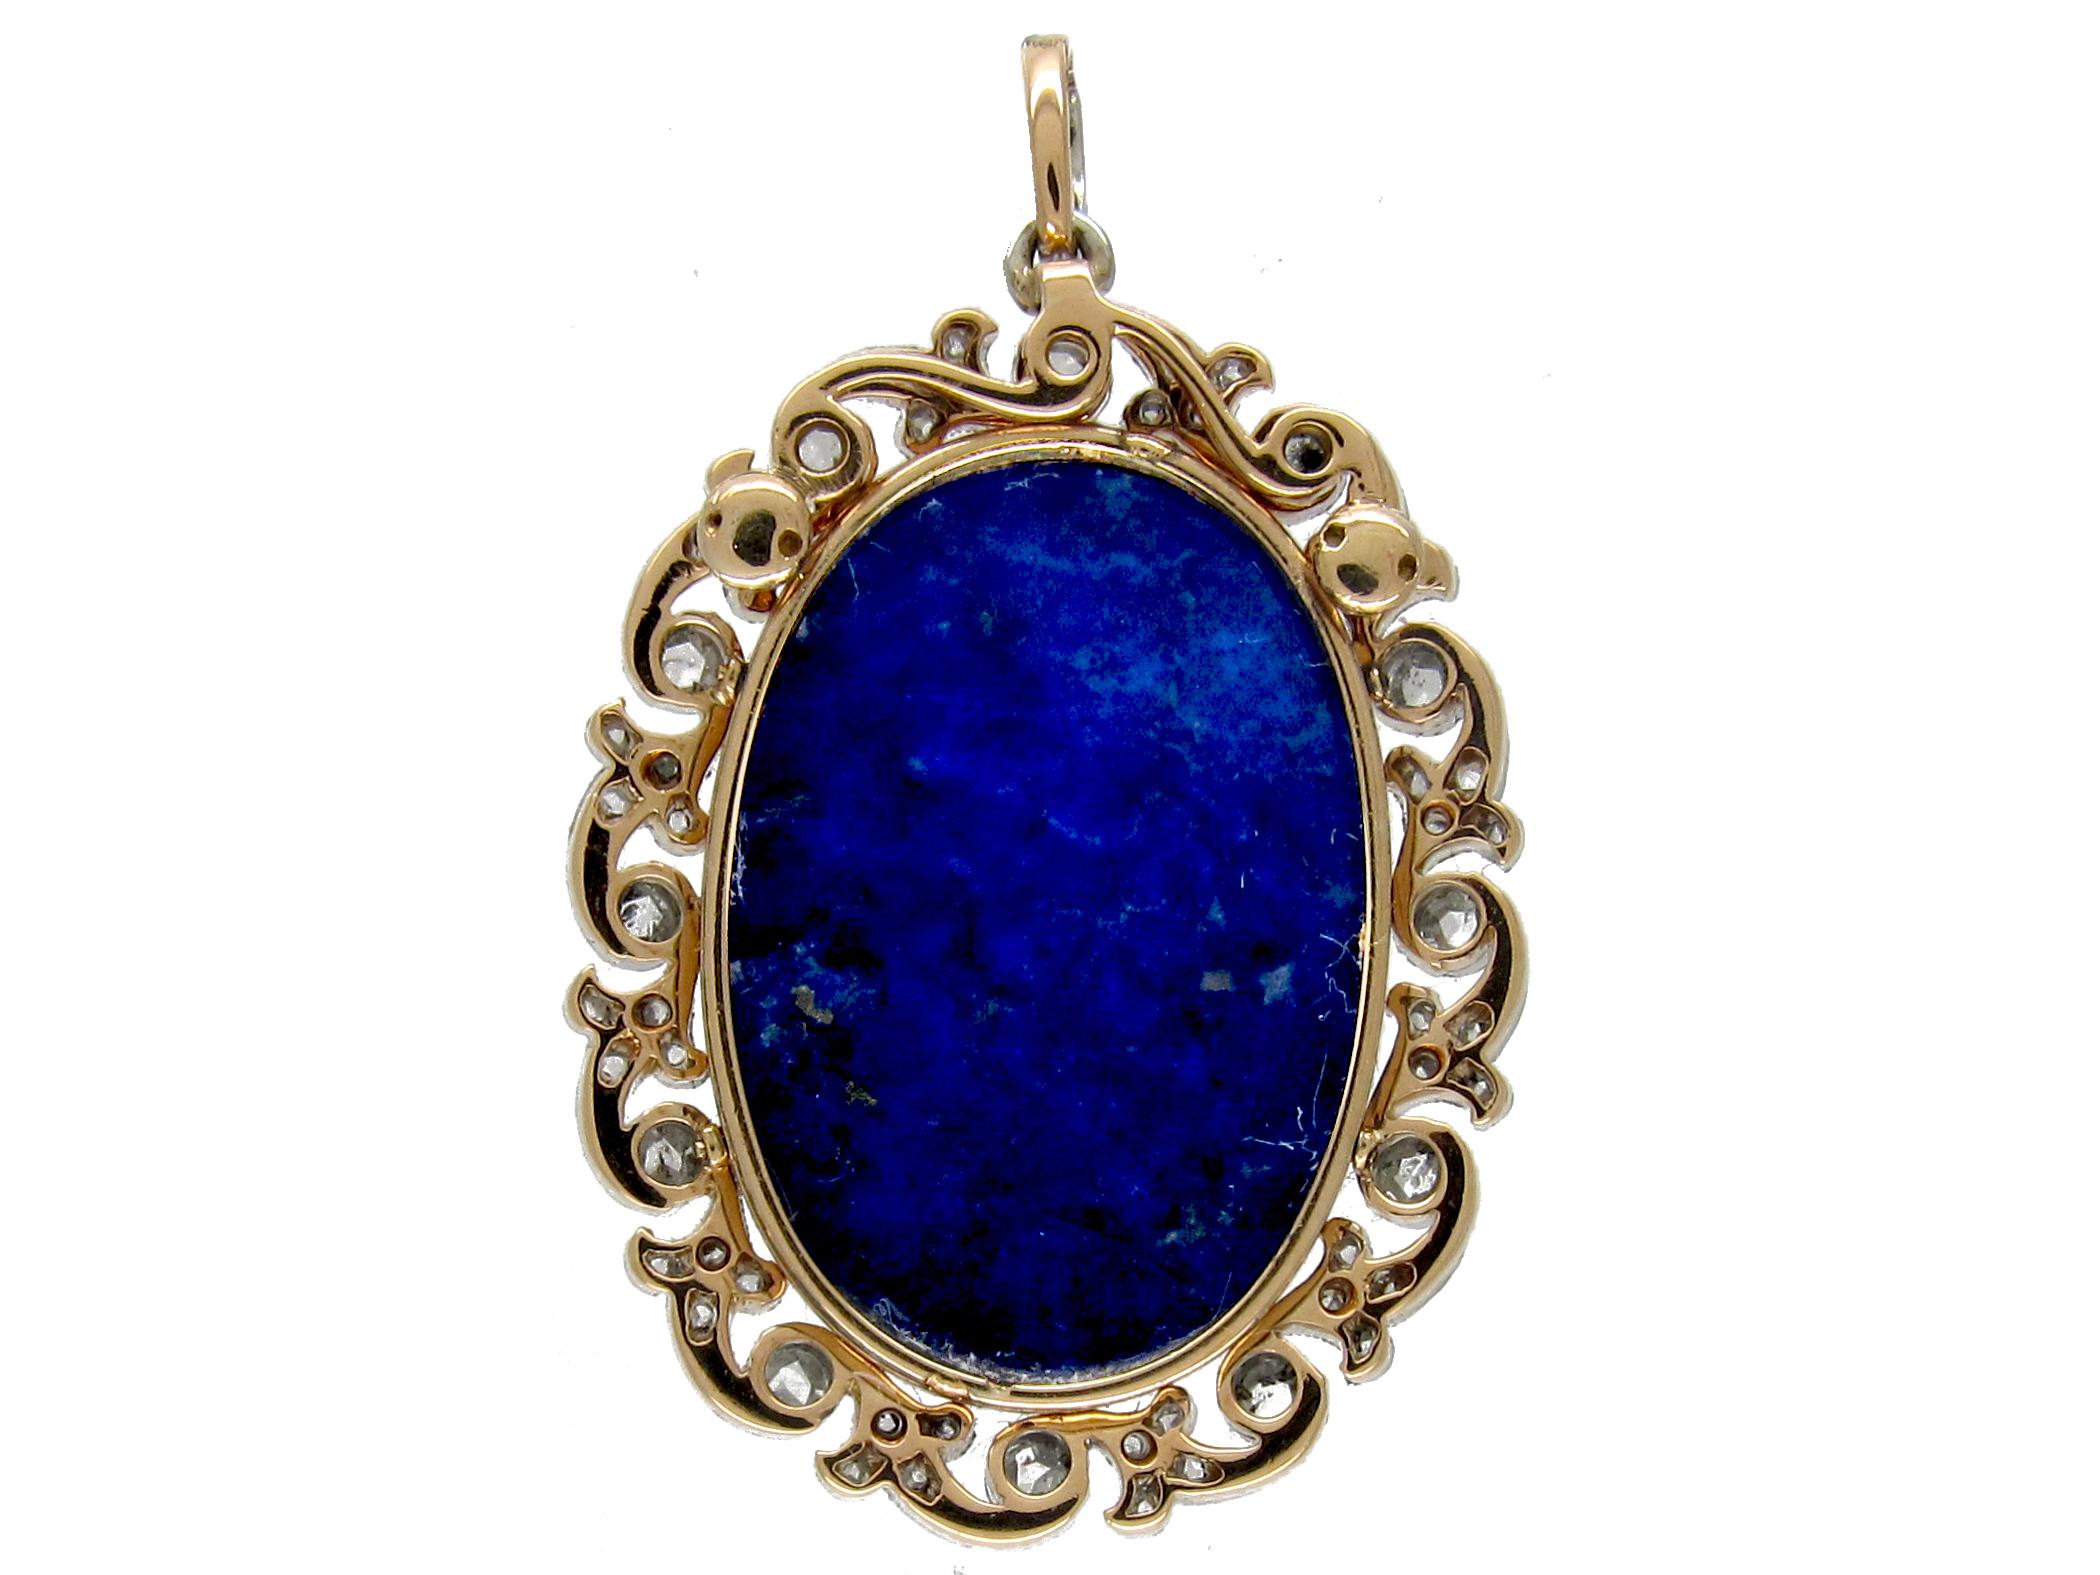 Lapis Lazuli & Diamond Art Nouveau Pendant on Chain